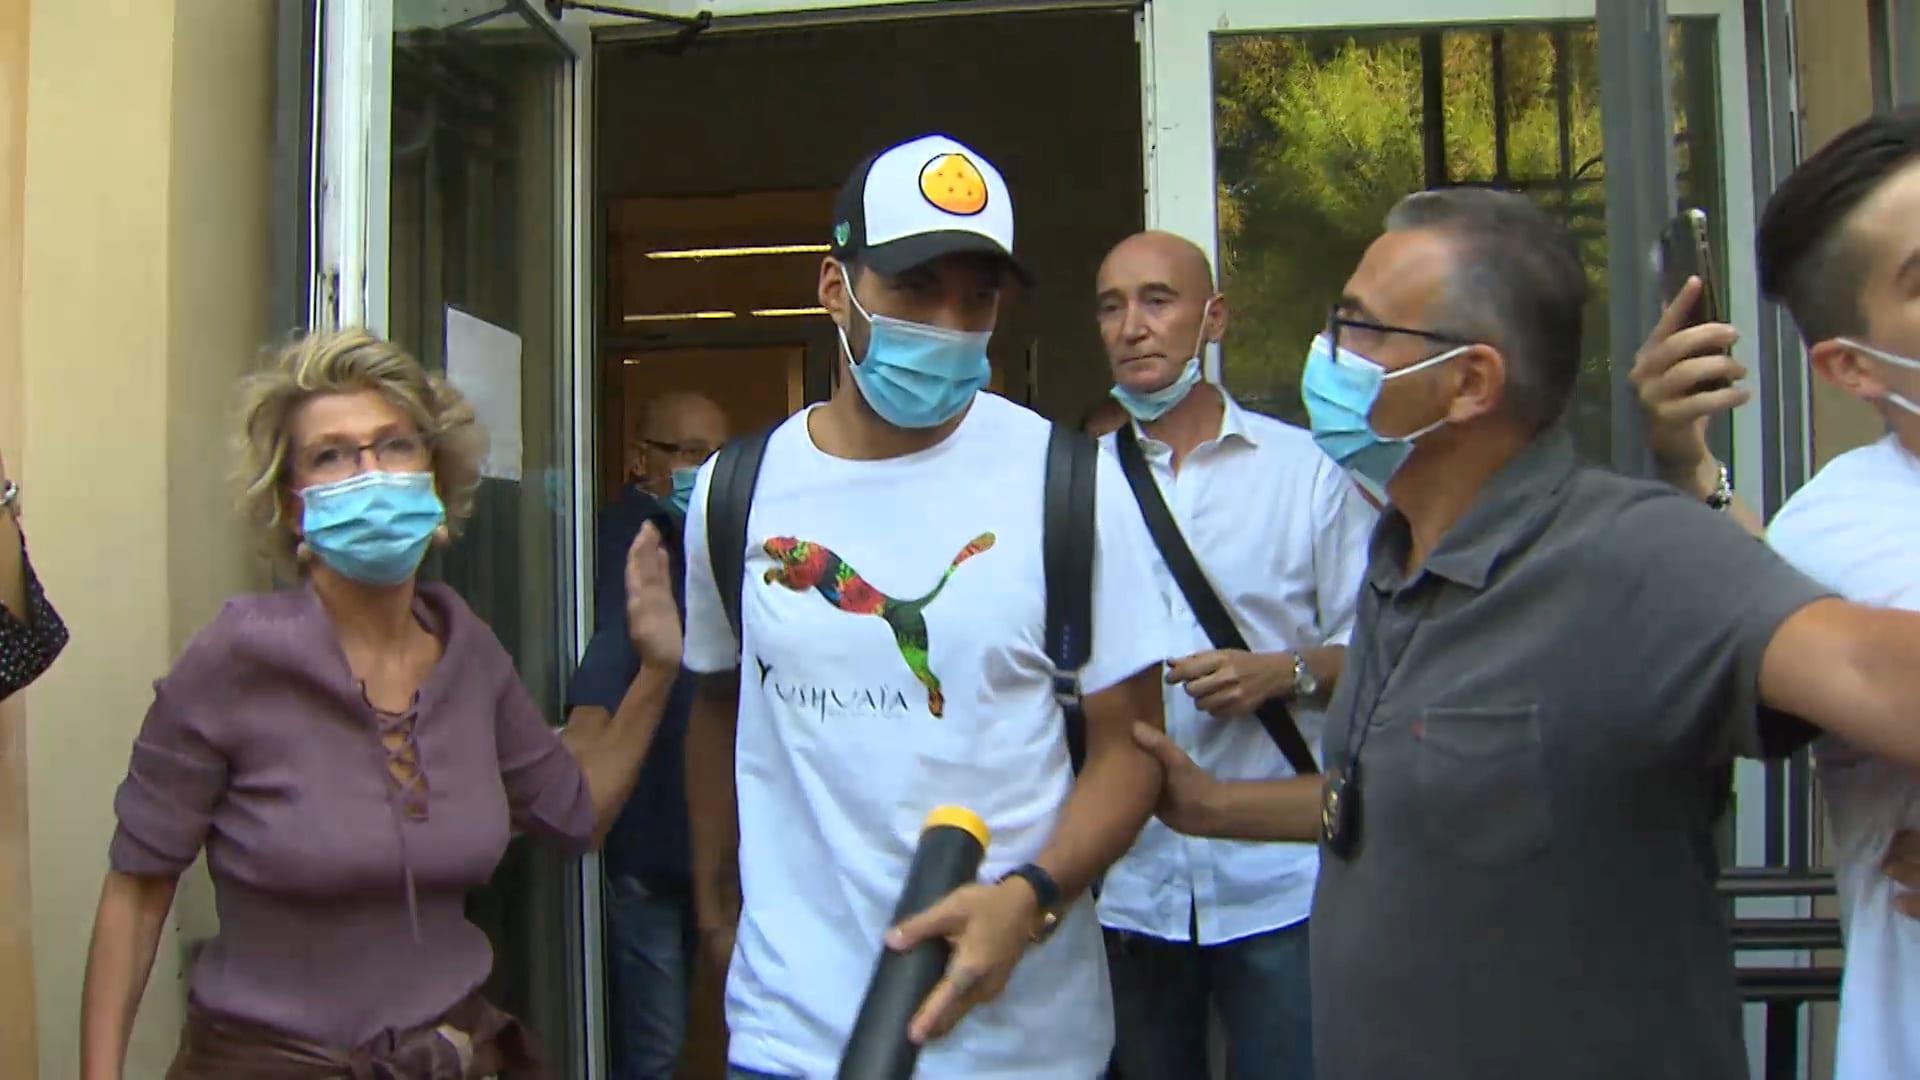 Suarez language exam for Italian citizenship 'rigged'